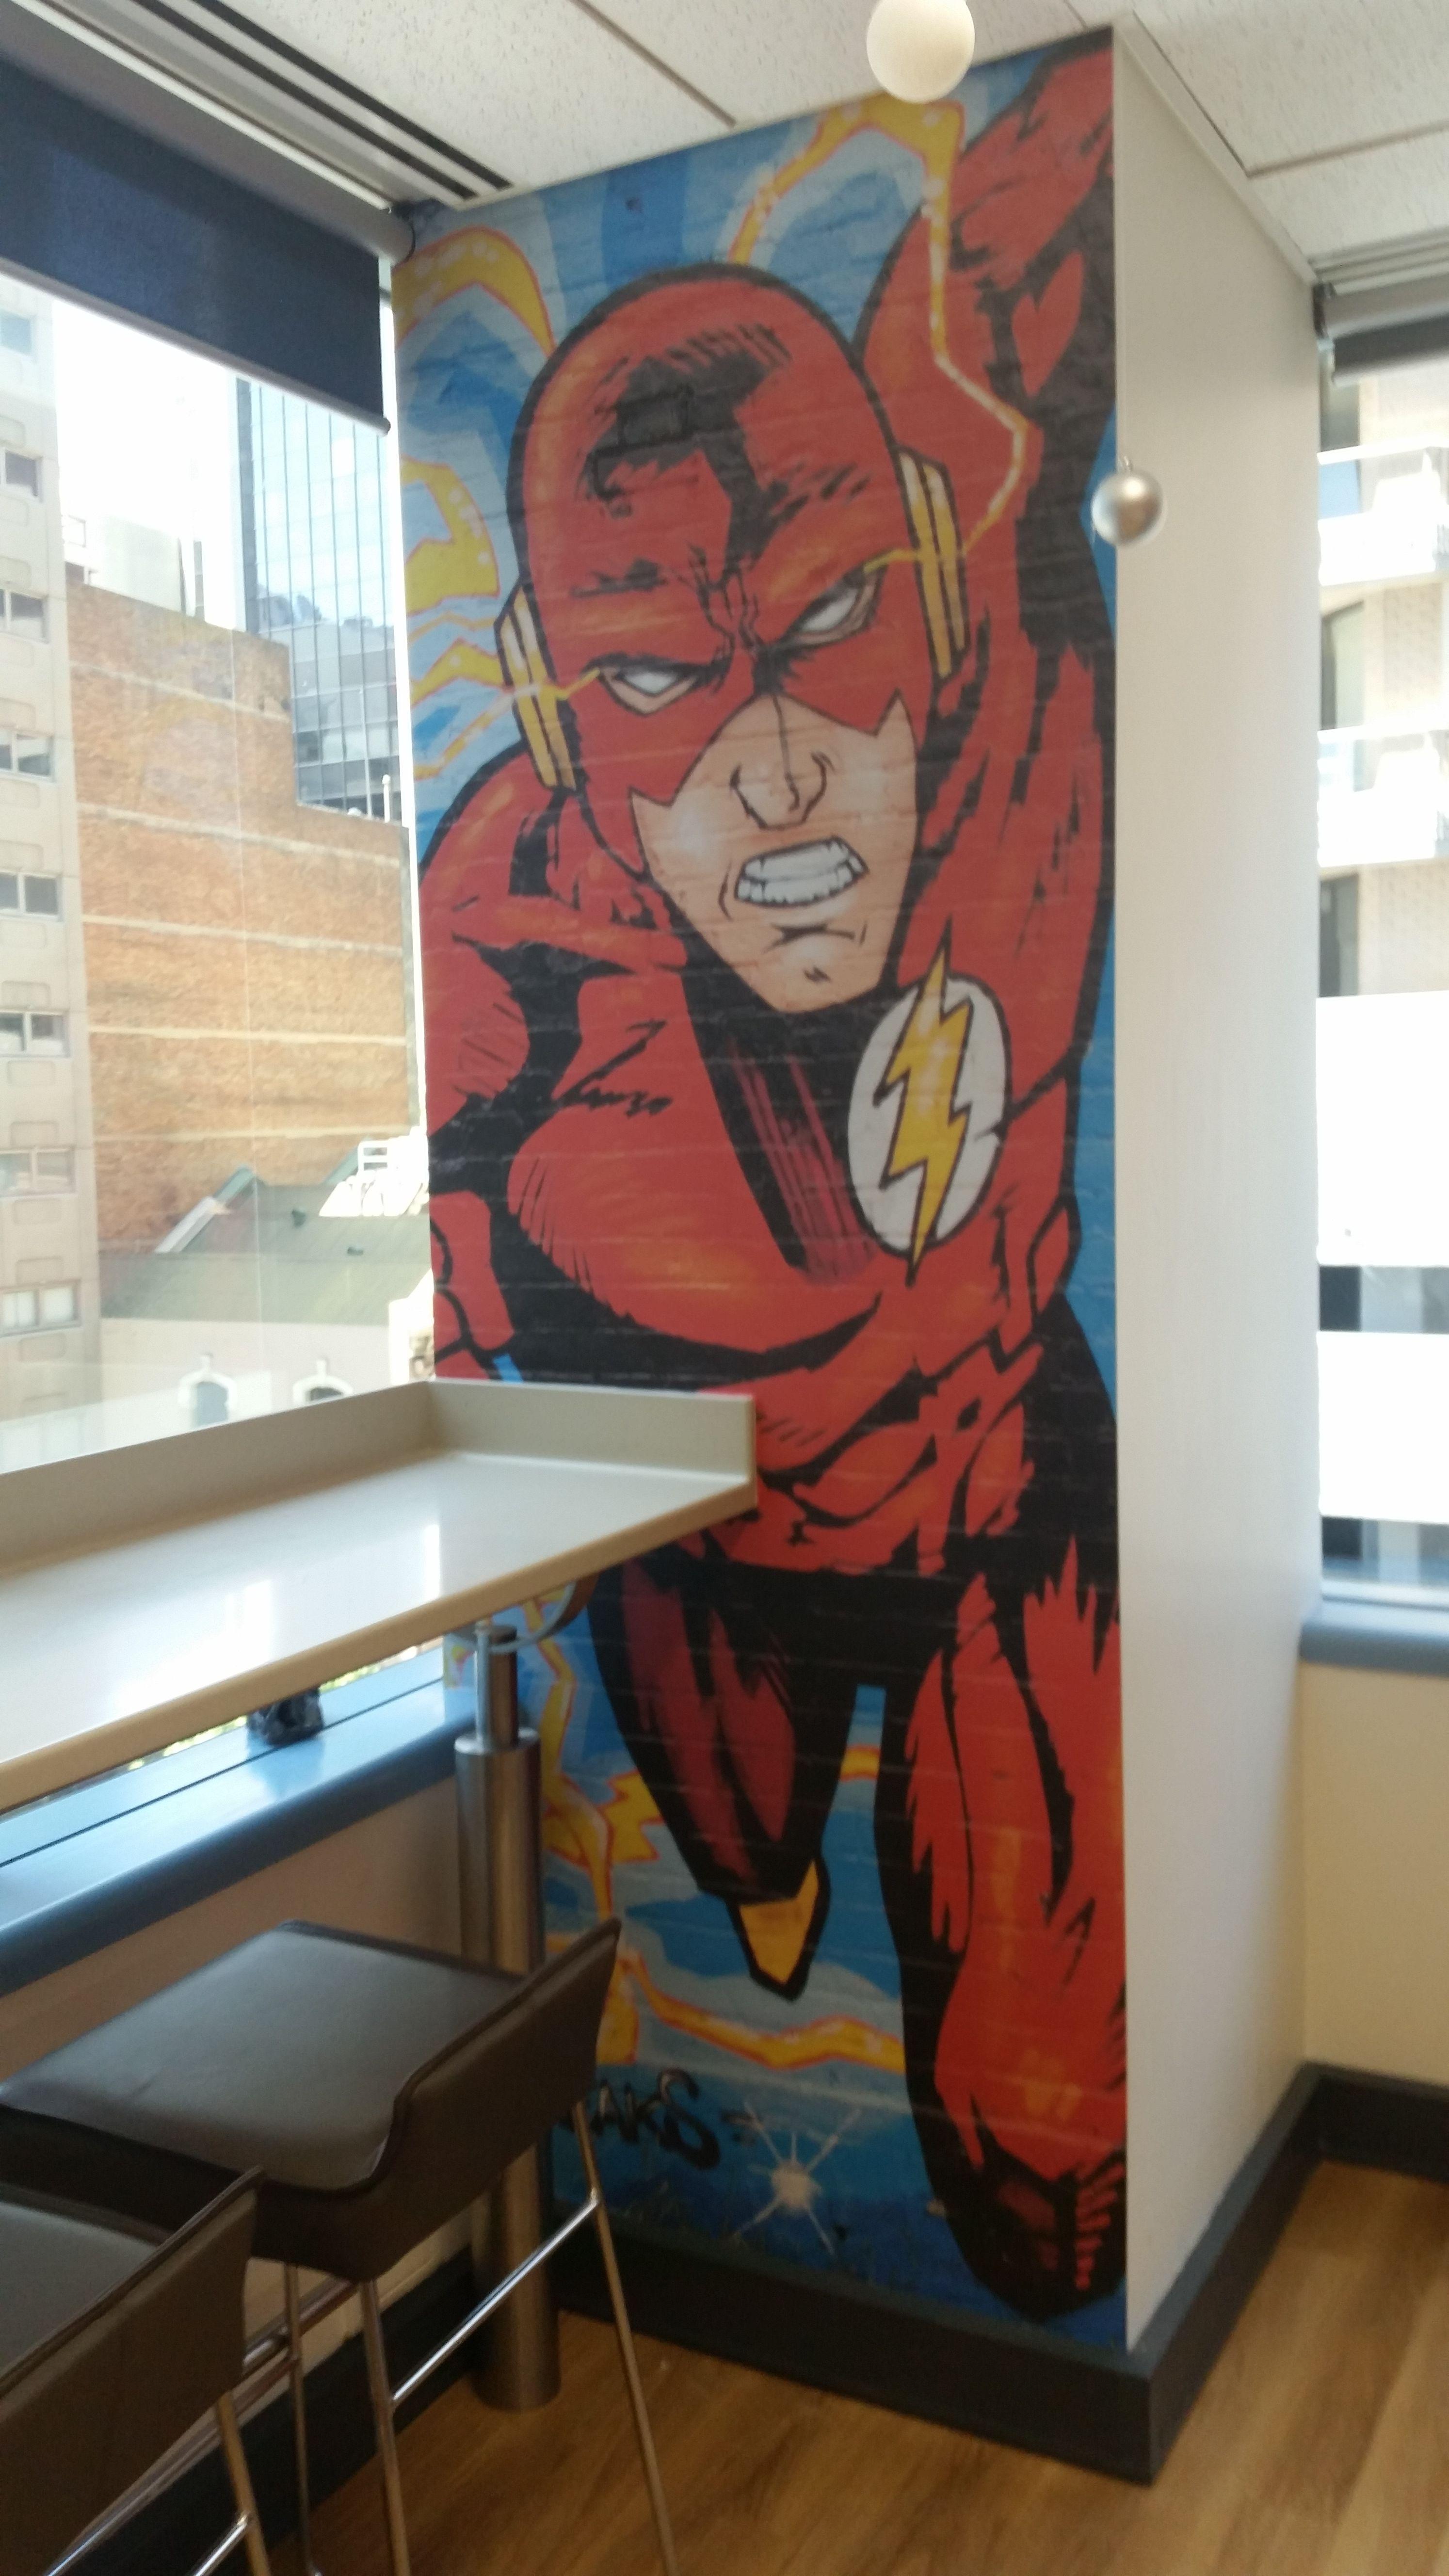 The Flash Wall Mural Wall Murals Mural Printed Shower Curtain